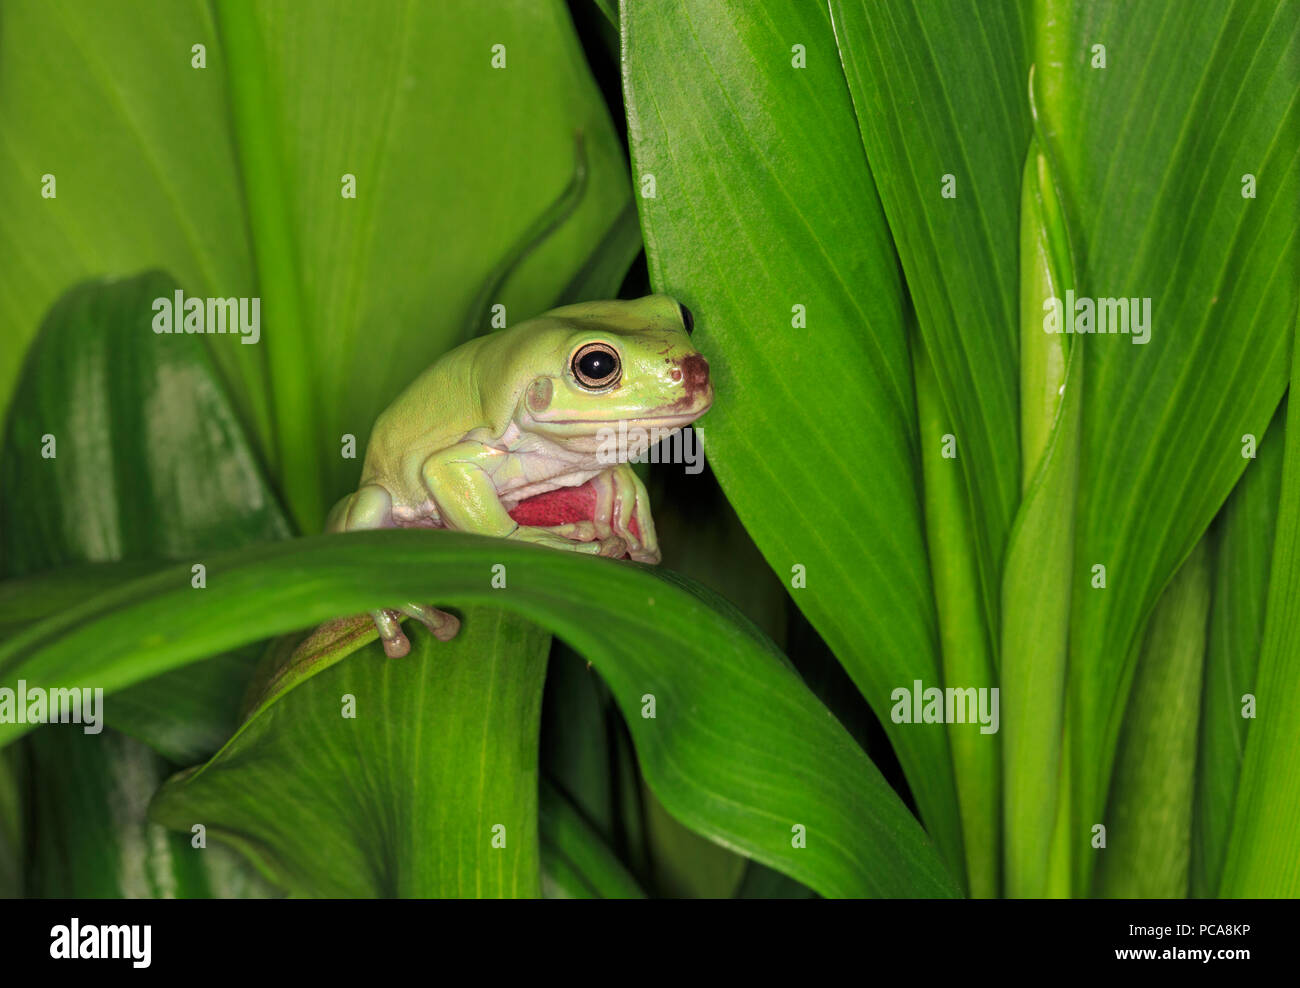 Australian dumpy tree frog or White's tree frog (Litoria caerulea) - Stock Image